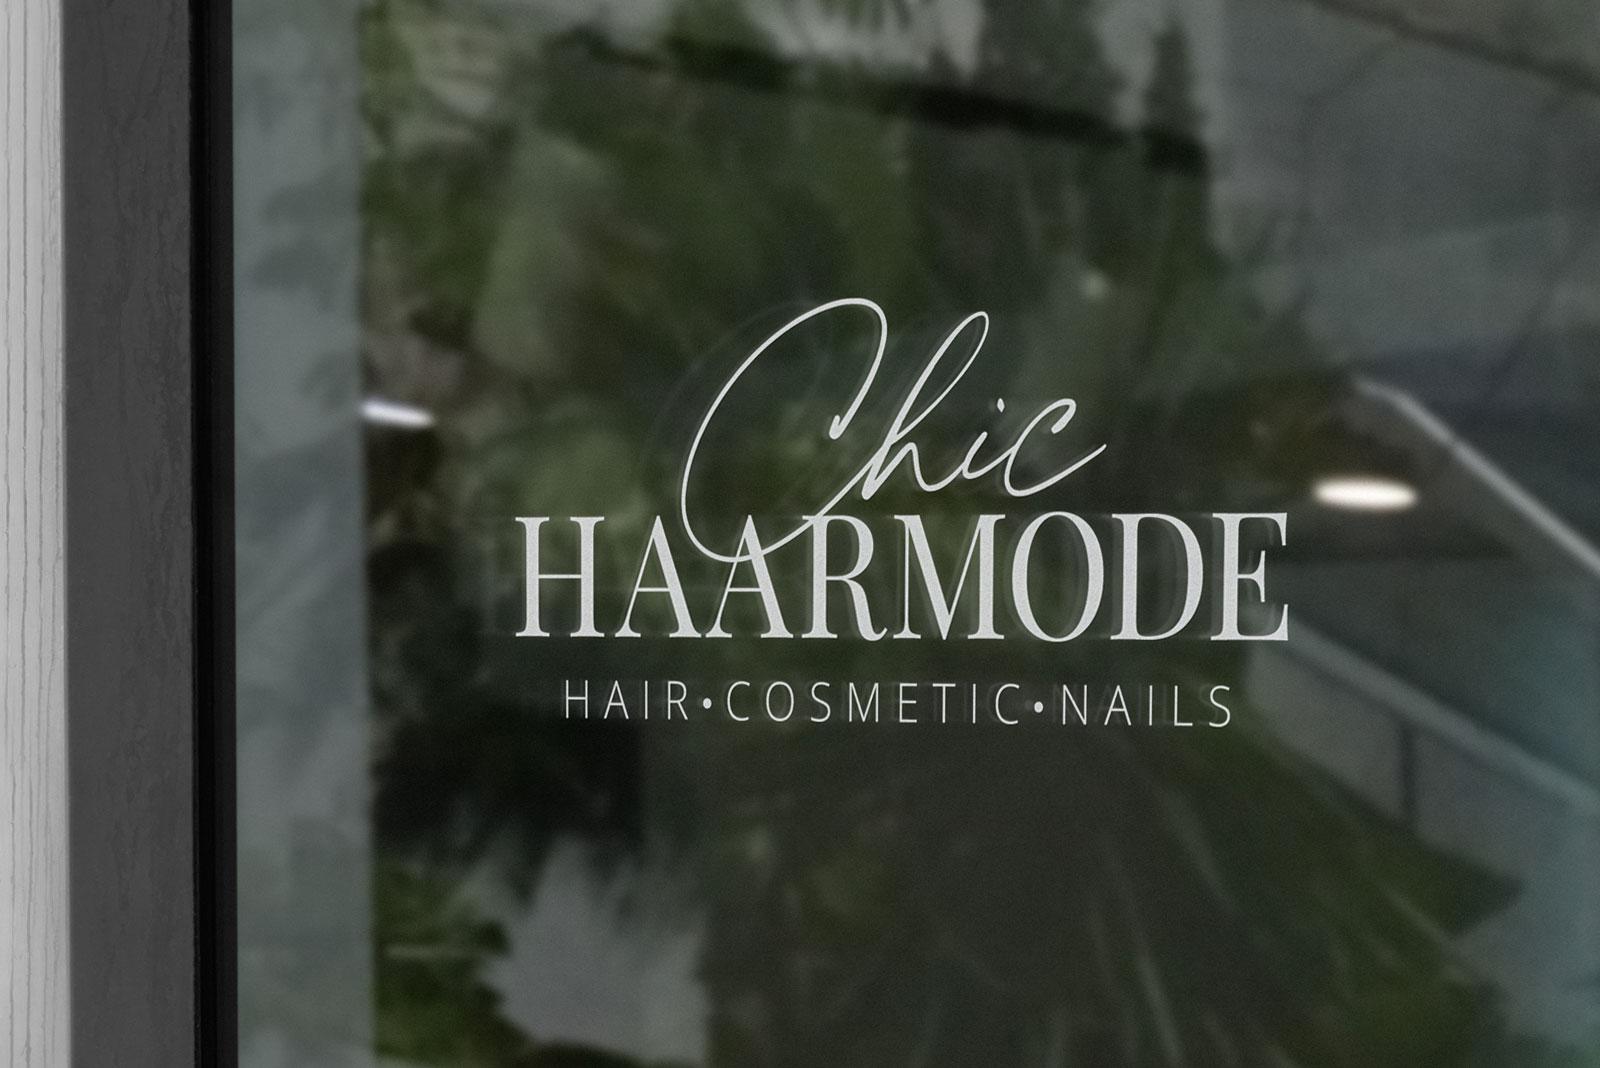 Pernet Design x Chic Haarmode Logodesign